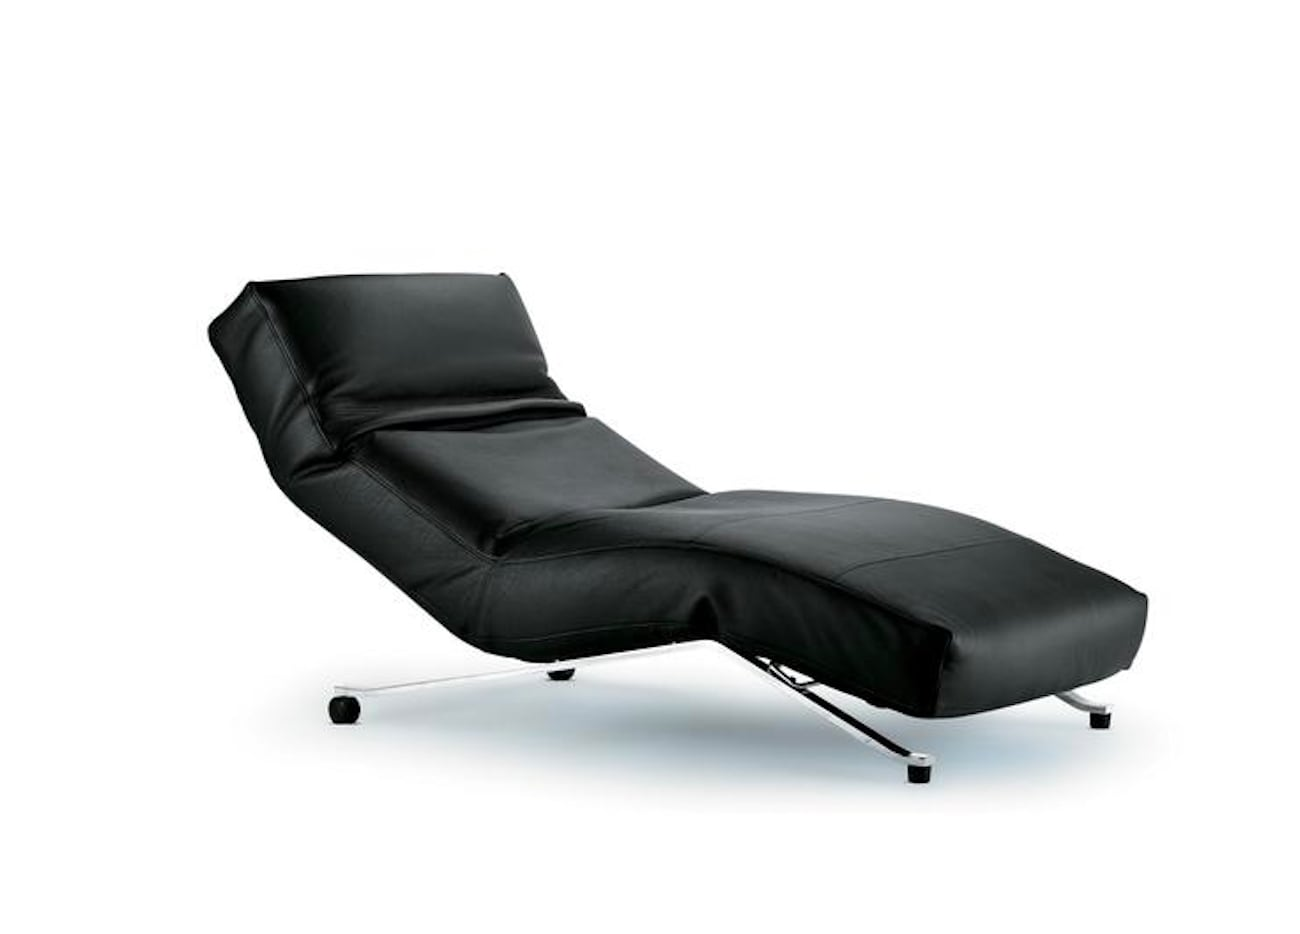 Eilersen Control Reclining Lounge Chair